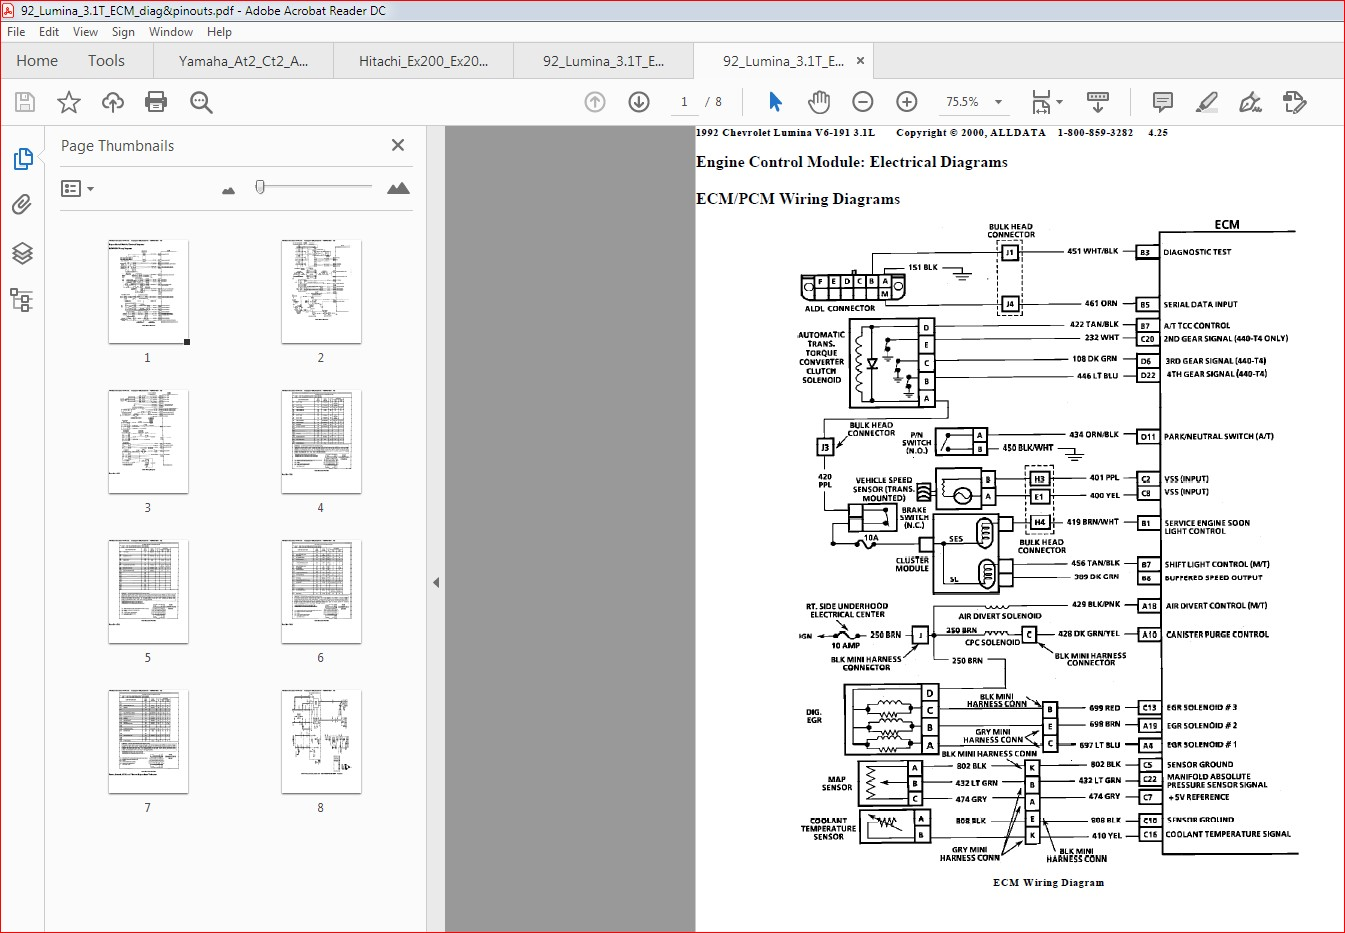 1992 Chevrolet Lumina Engine Control Module Wiring Diagram